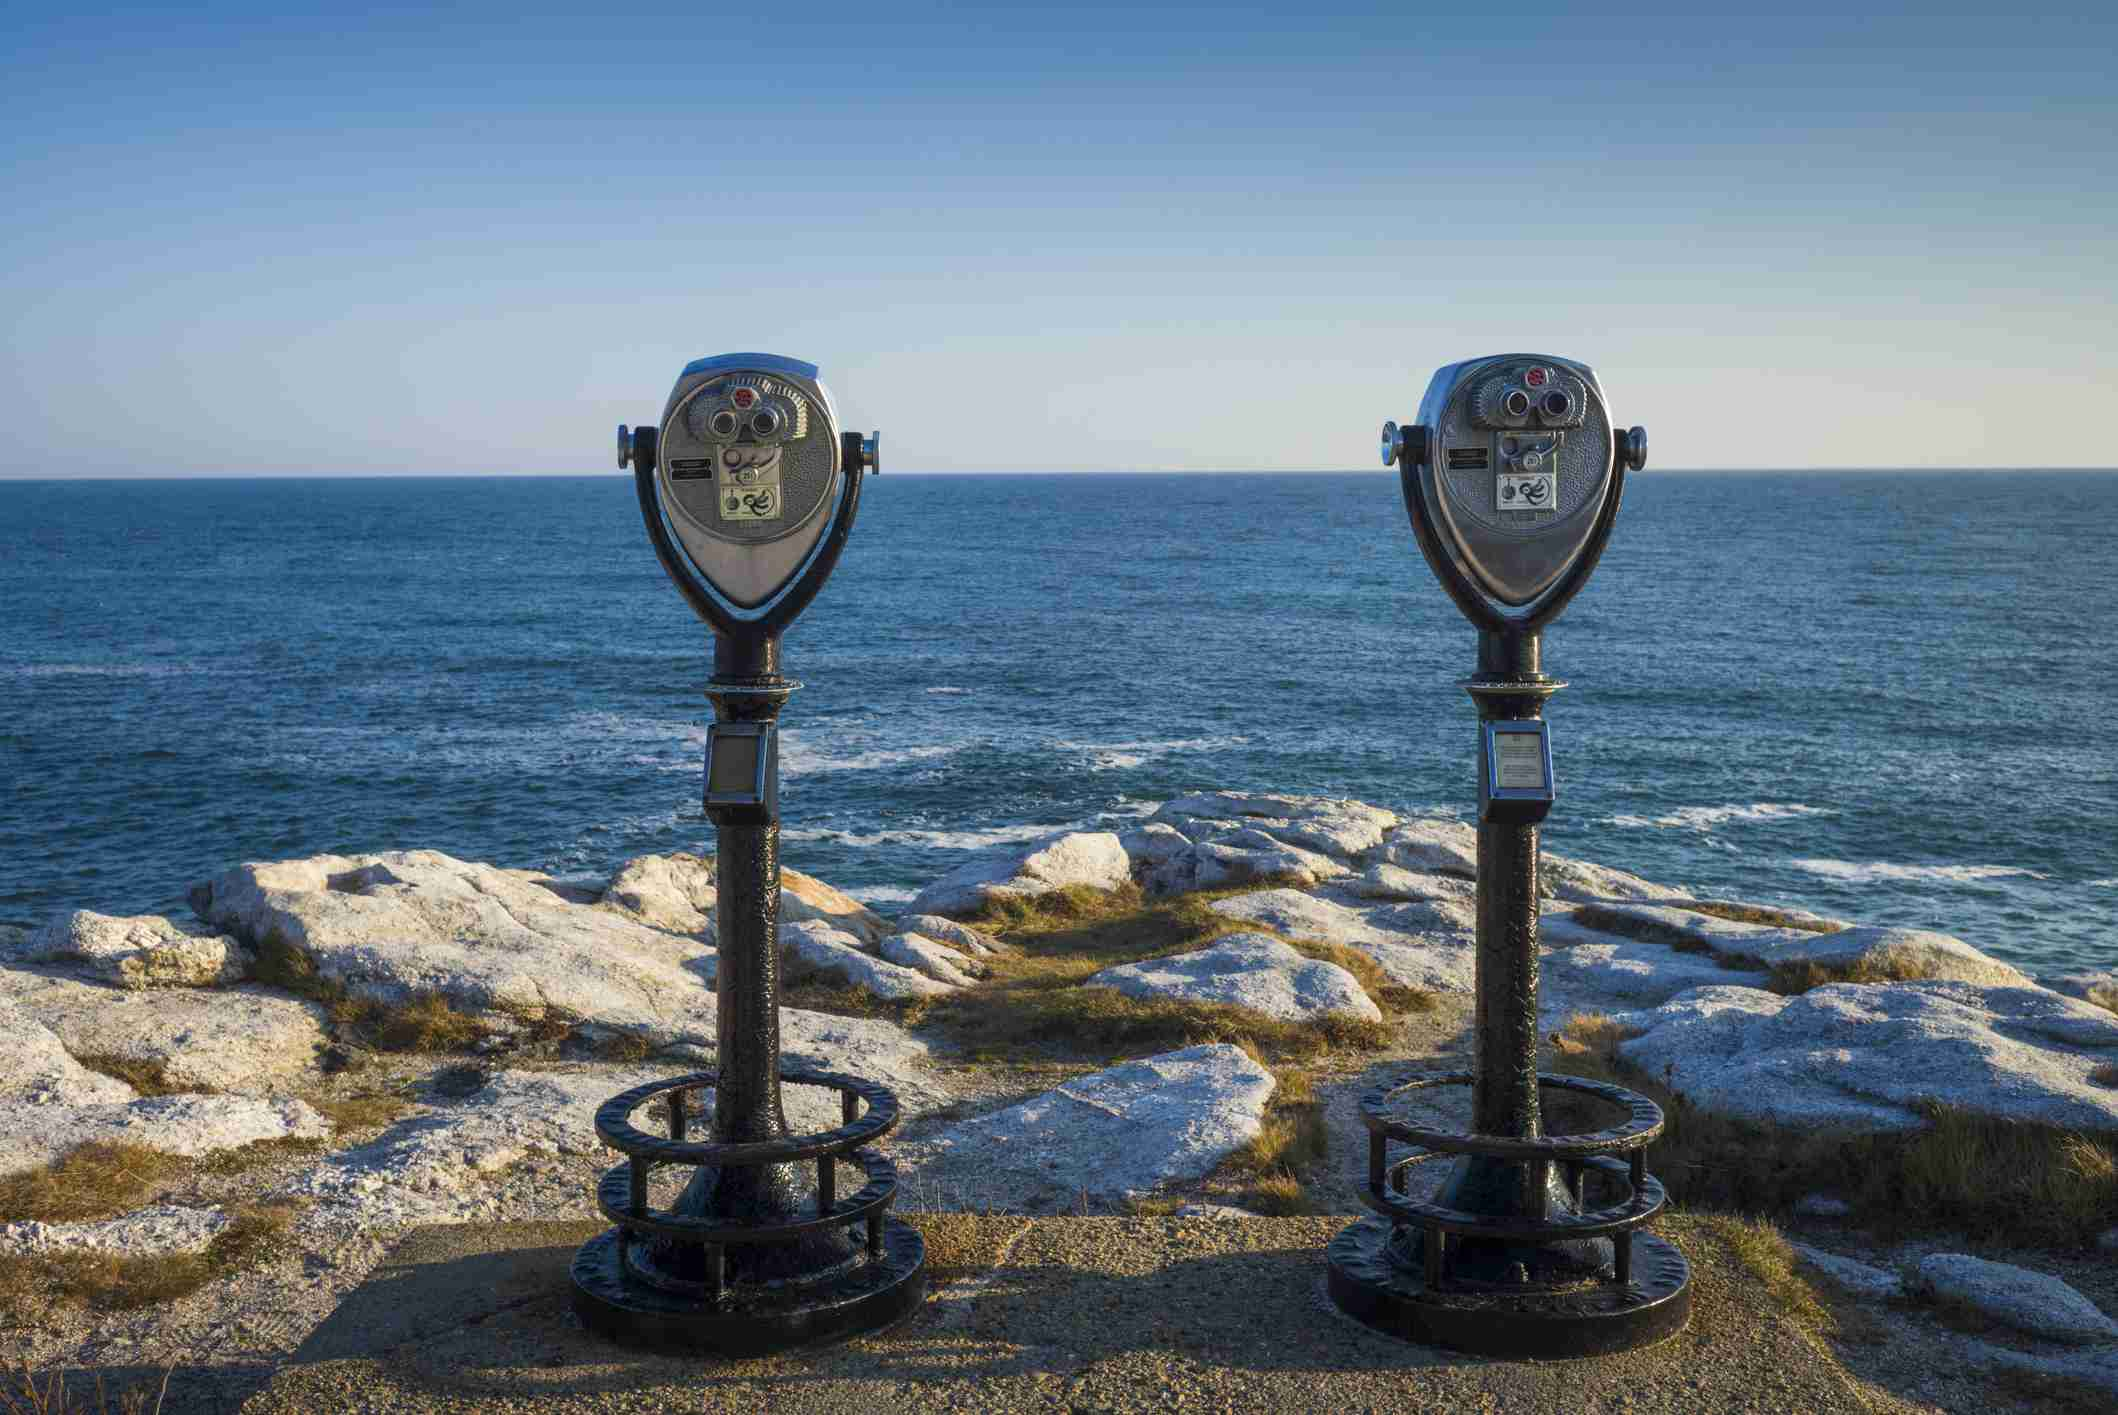 USA, North America, Maine, Reid State Park, Coin operated binoculars against sea